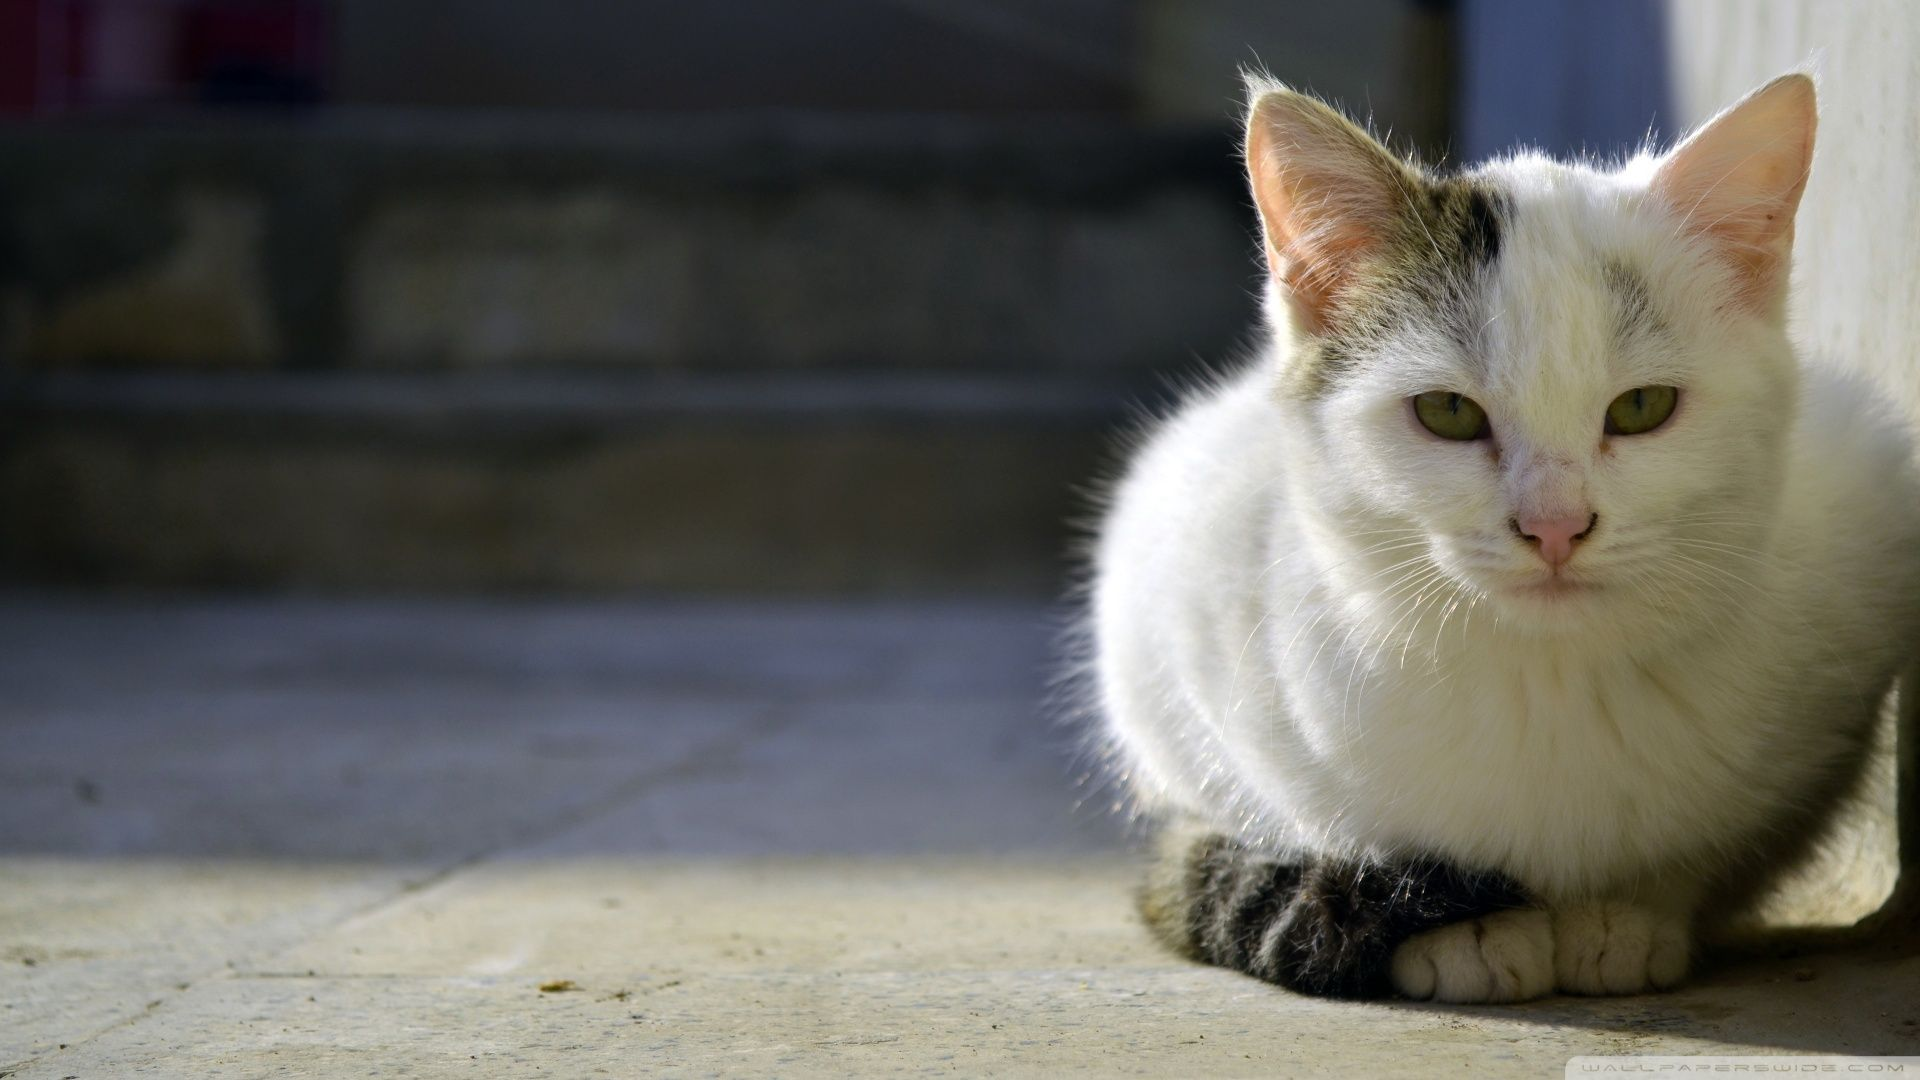 Hd wallpaper cat - Persian Cat Hd Wallpapers Backgrounds Wallpaper